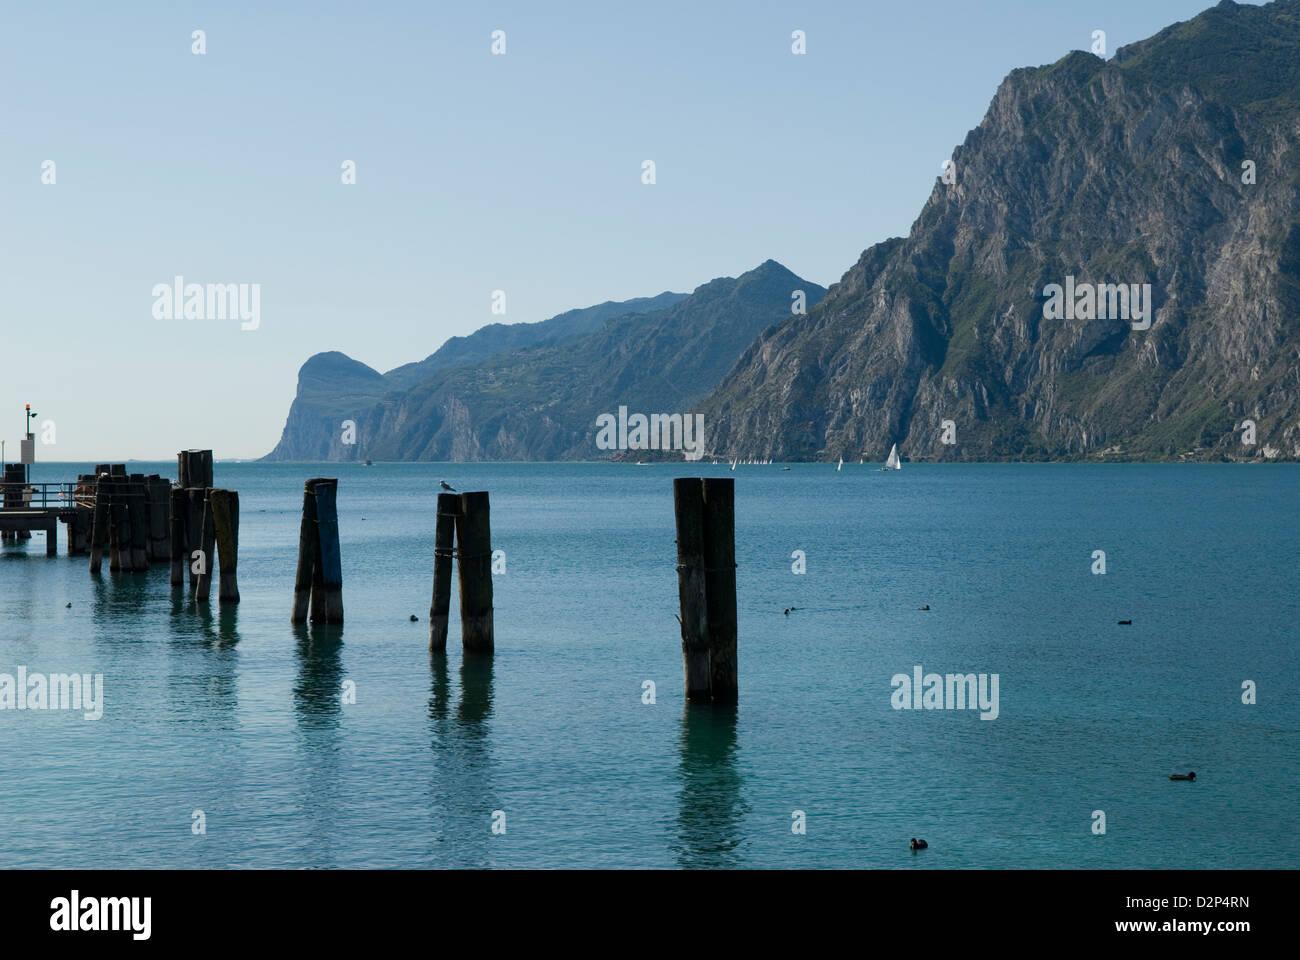 Torbole Trentino-Alto Adige Italy travel tourism Stock Photo